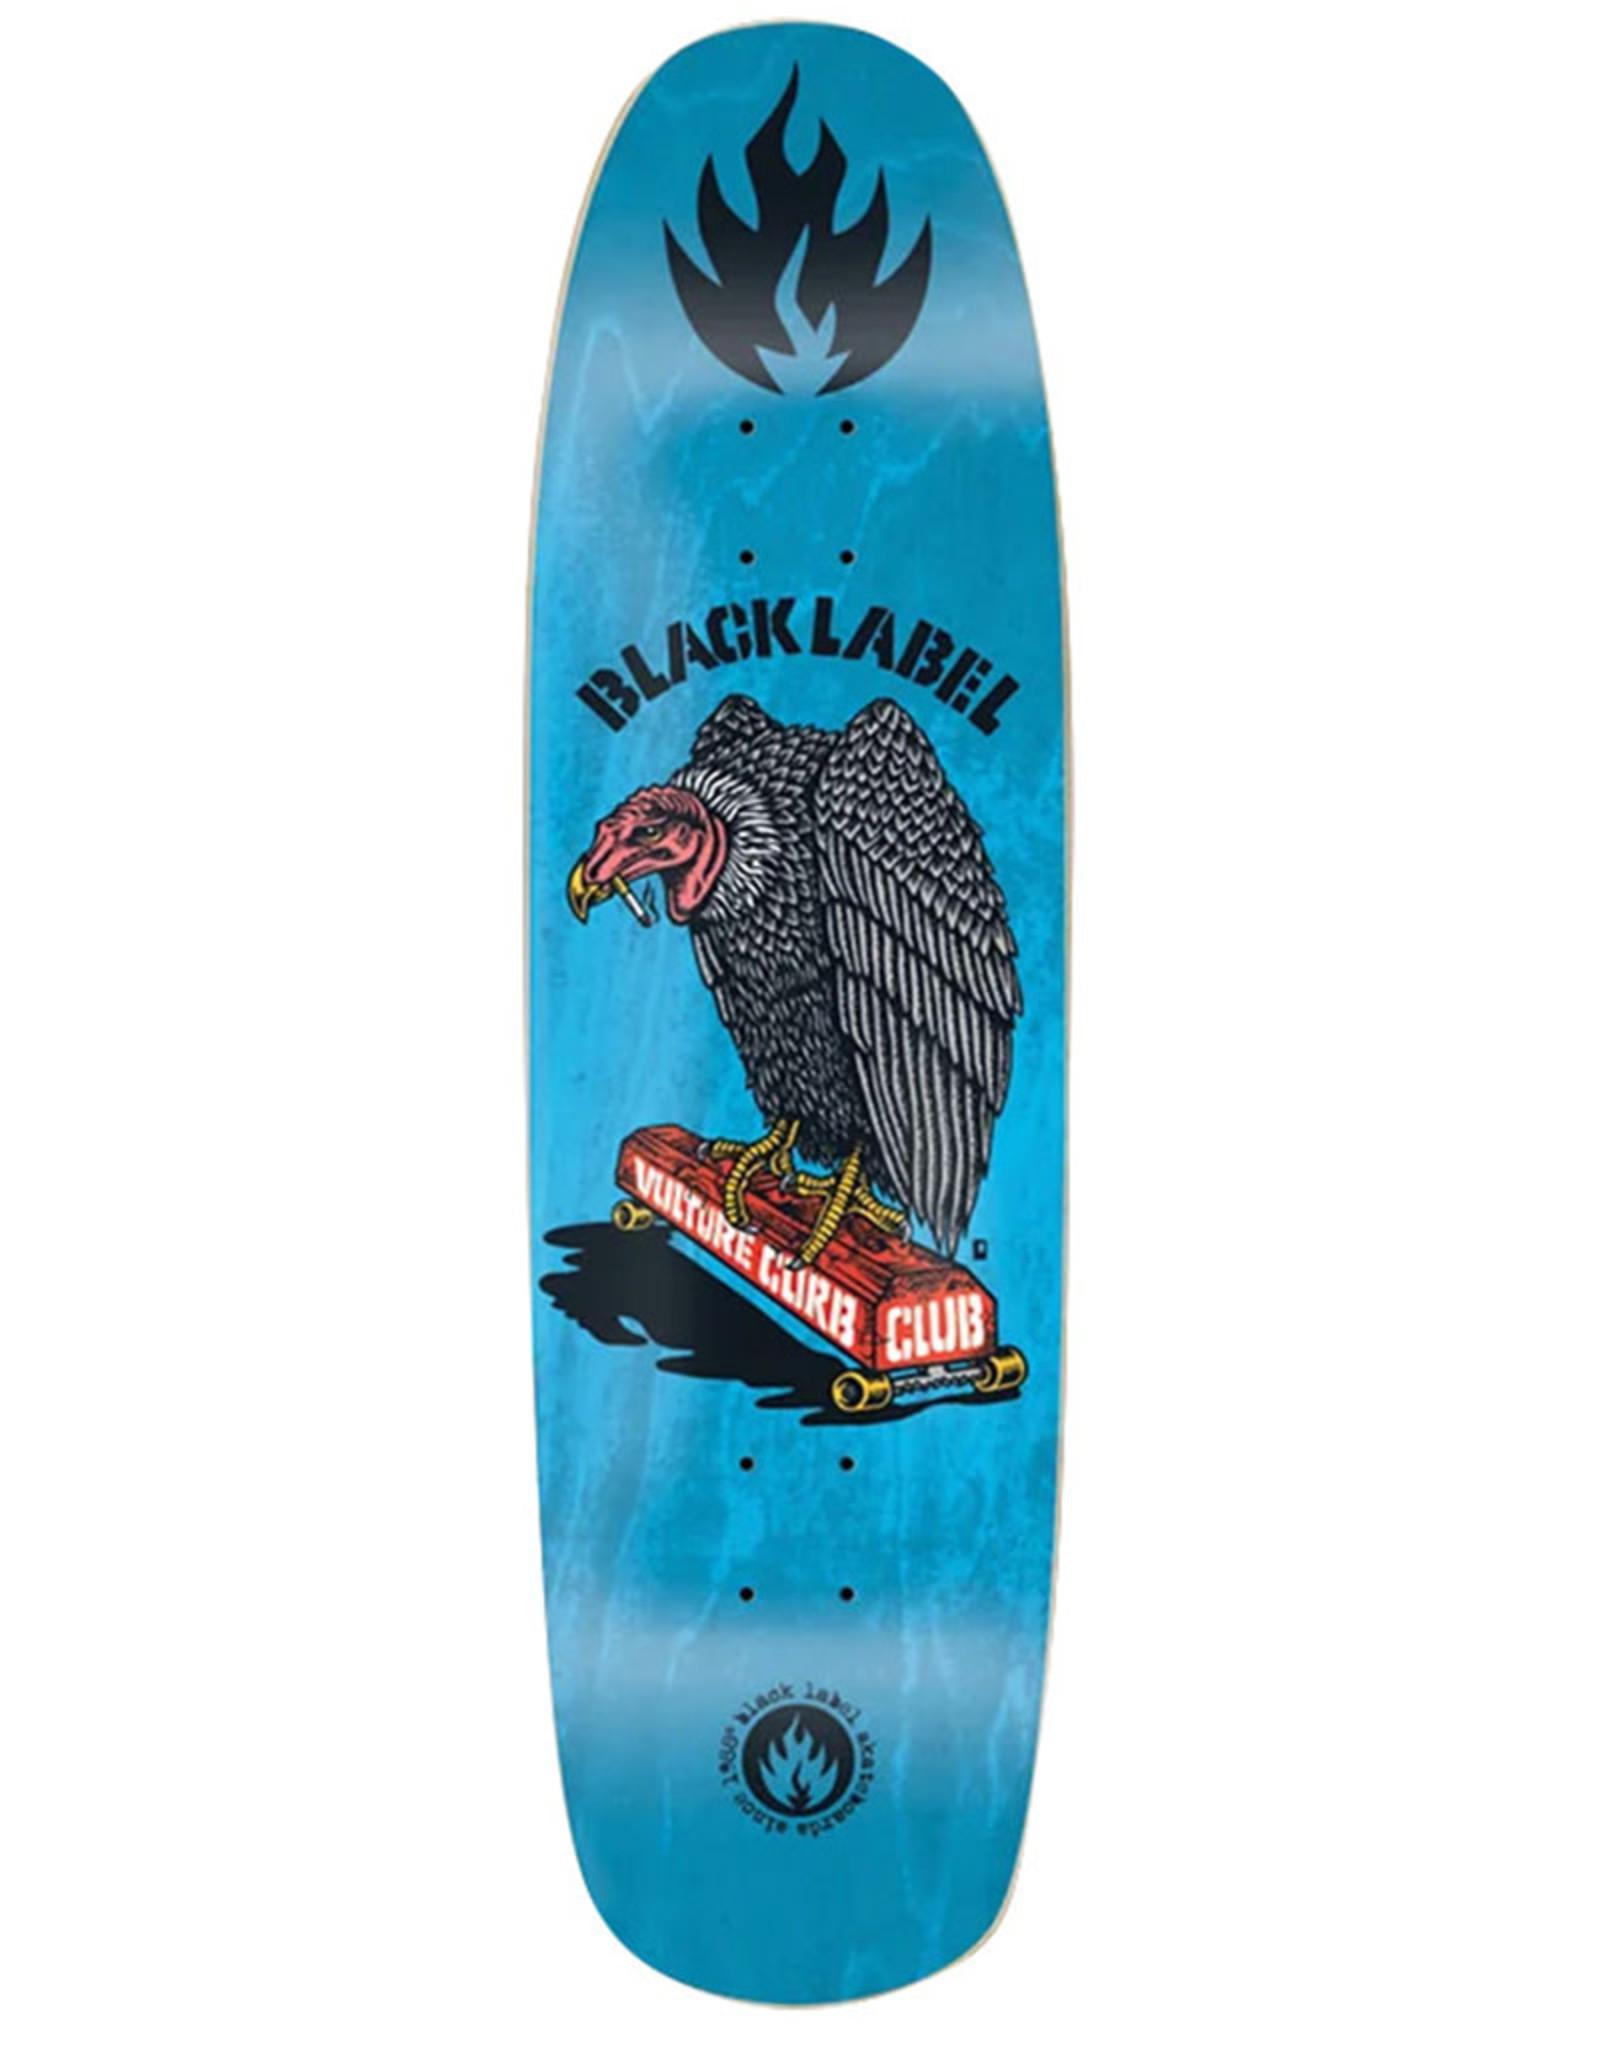 Black Label Black Label Deck Team Vulture Curb Club Blue Stain (8.88)